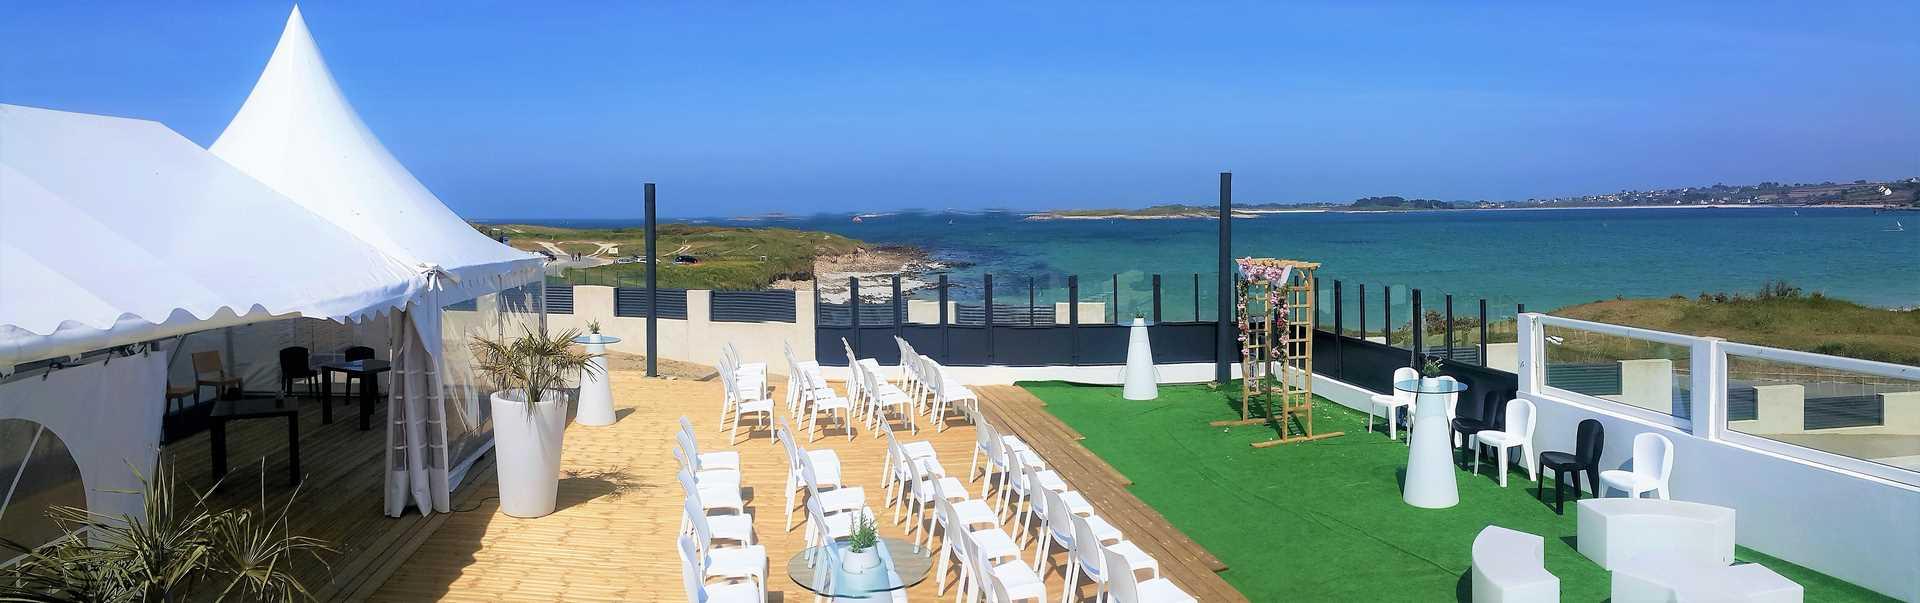 salle de mariage terrasse vue mer barnum